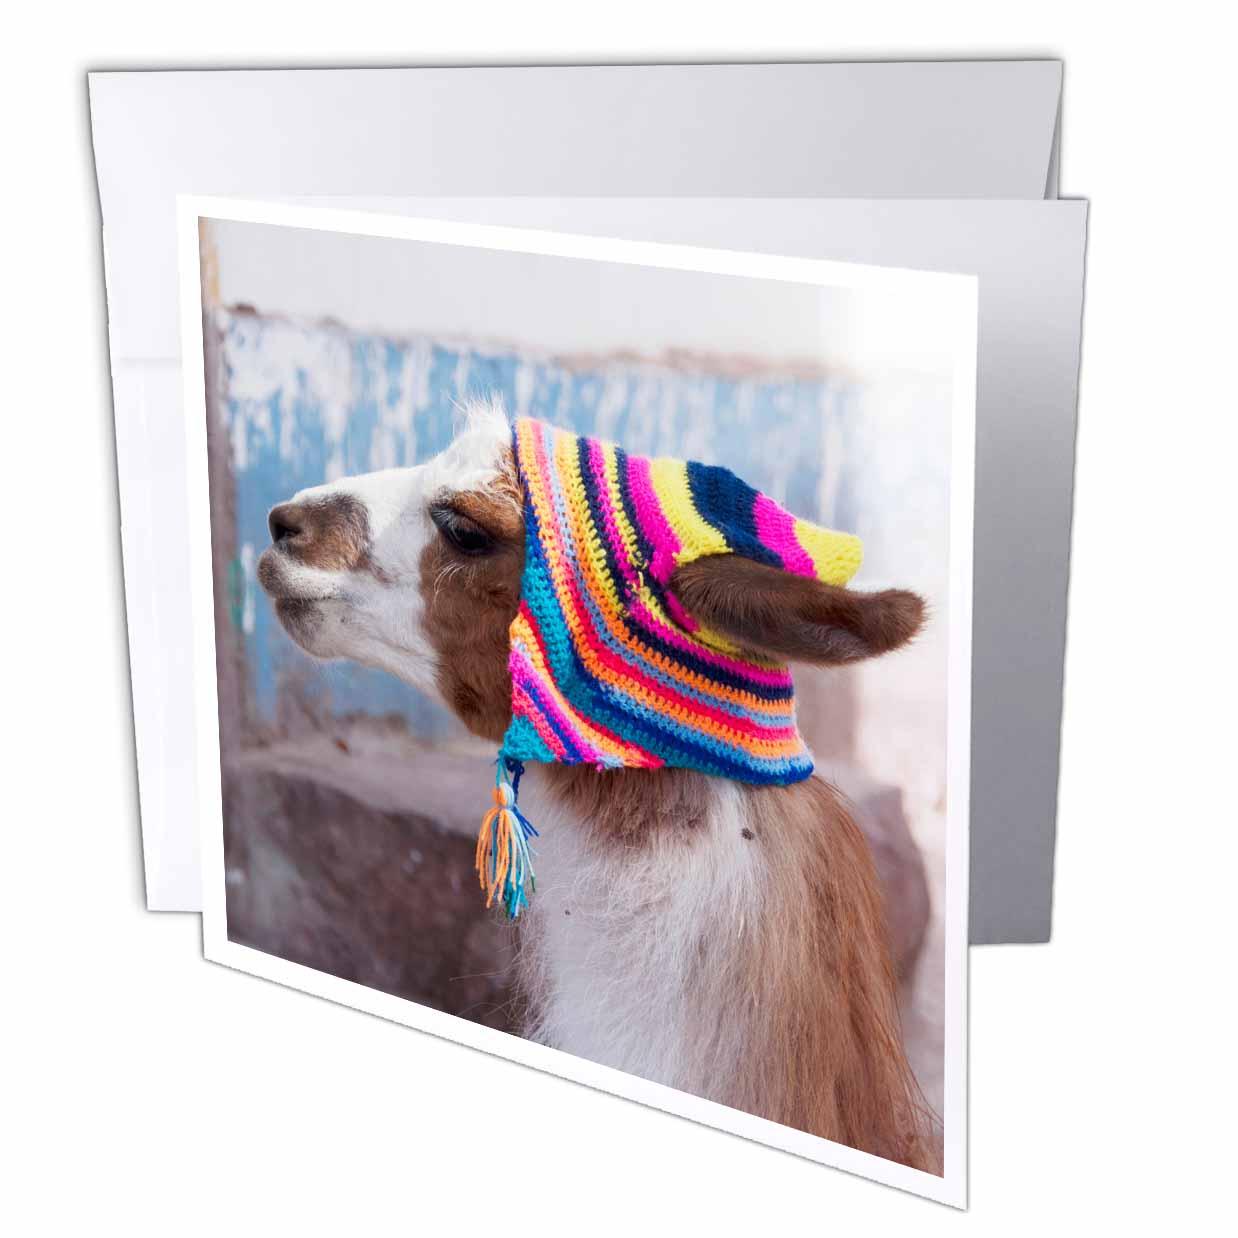 3dRose Peru, llama in a village - SA17 JRI0005 - Jutta Riegel, Greeting Cards, 6 x 6 inches, set of 12